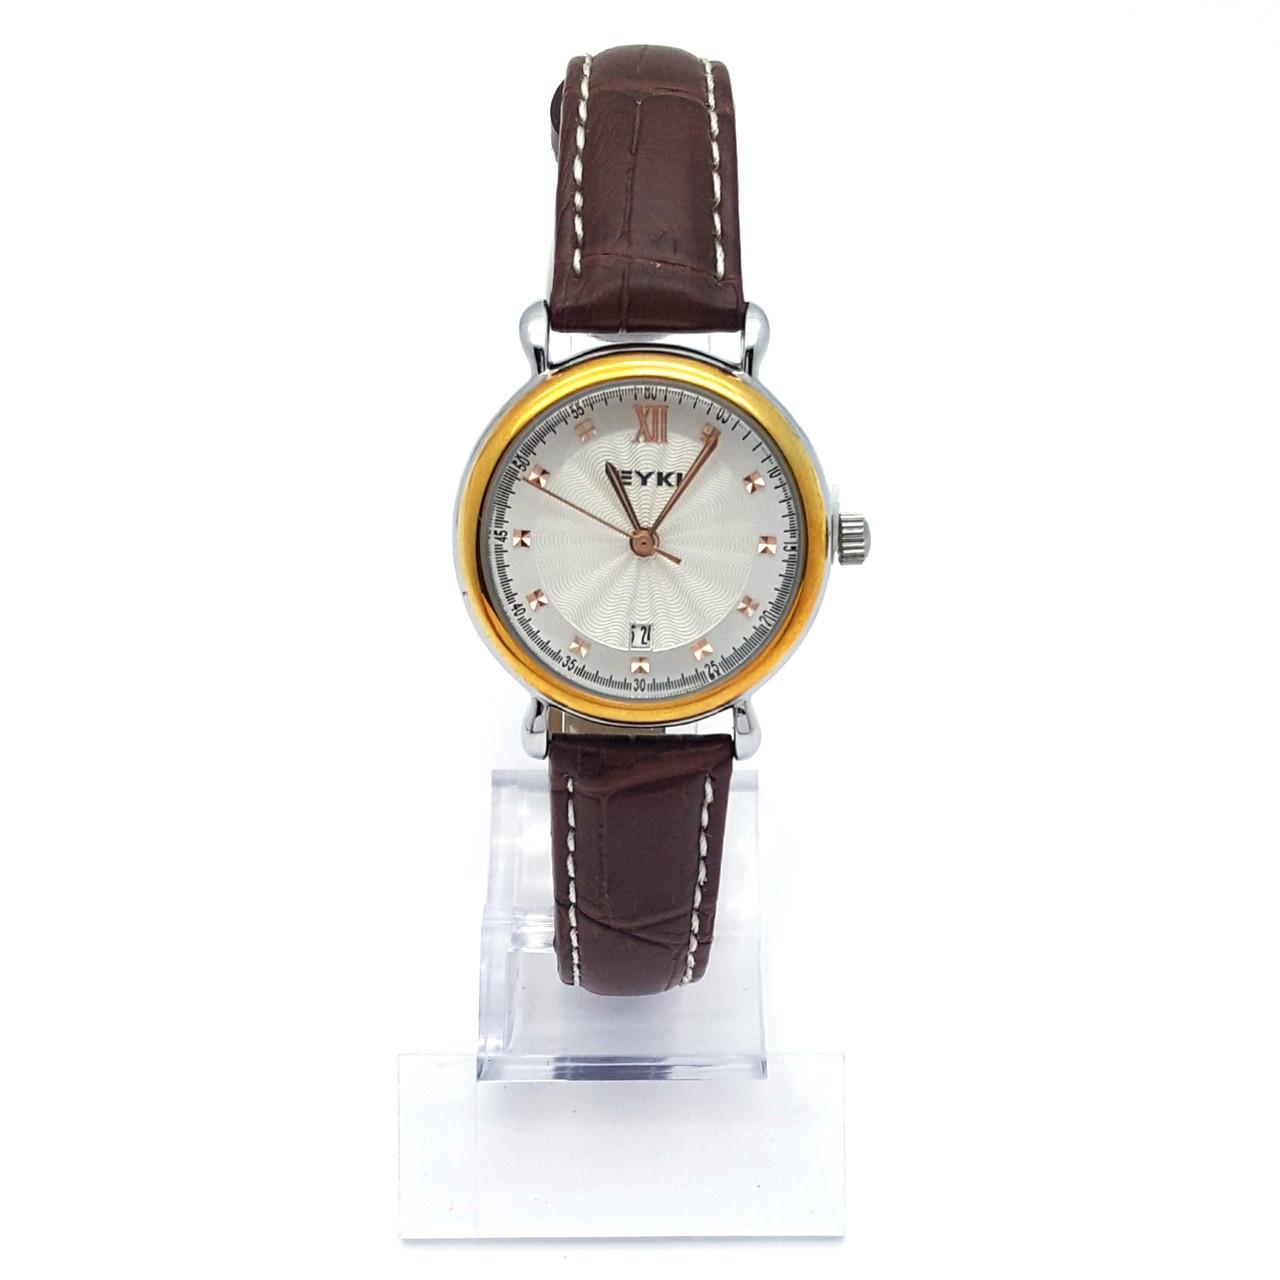 Часы EYKI на коричневом ремешке, длина ремешка 15-19см, циферблат 28мм